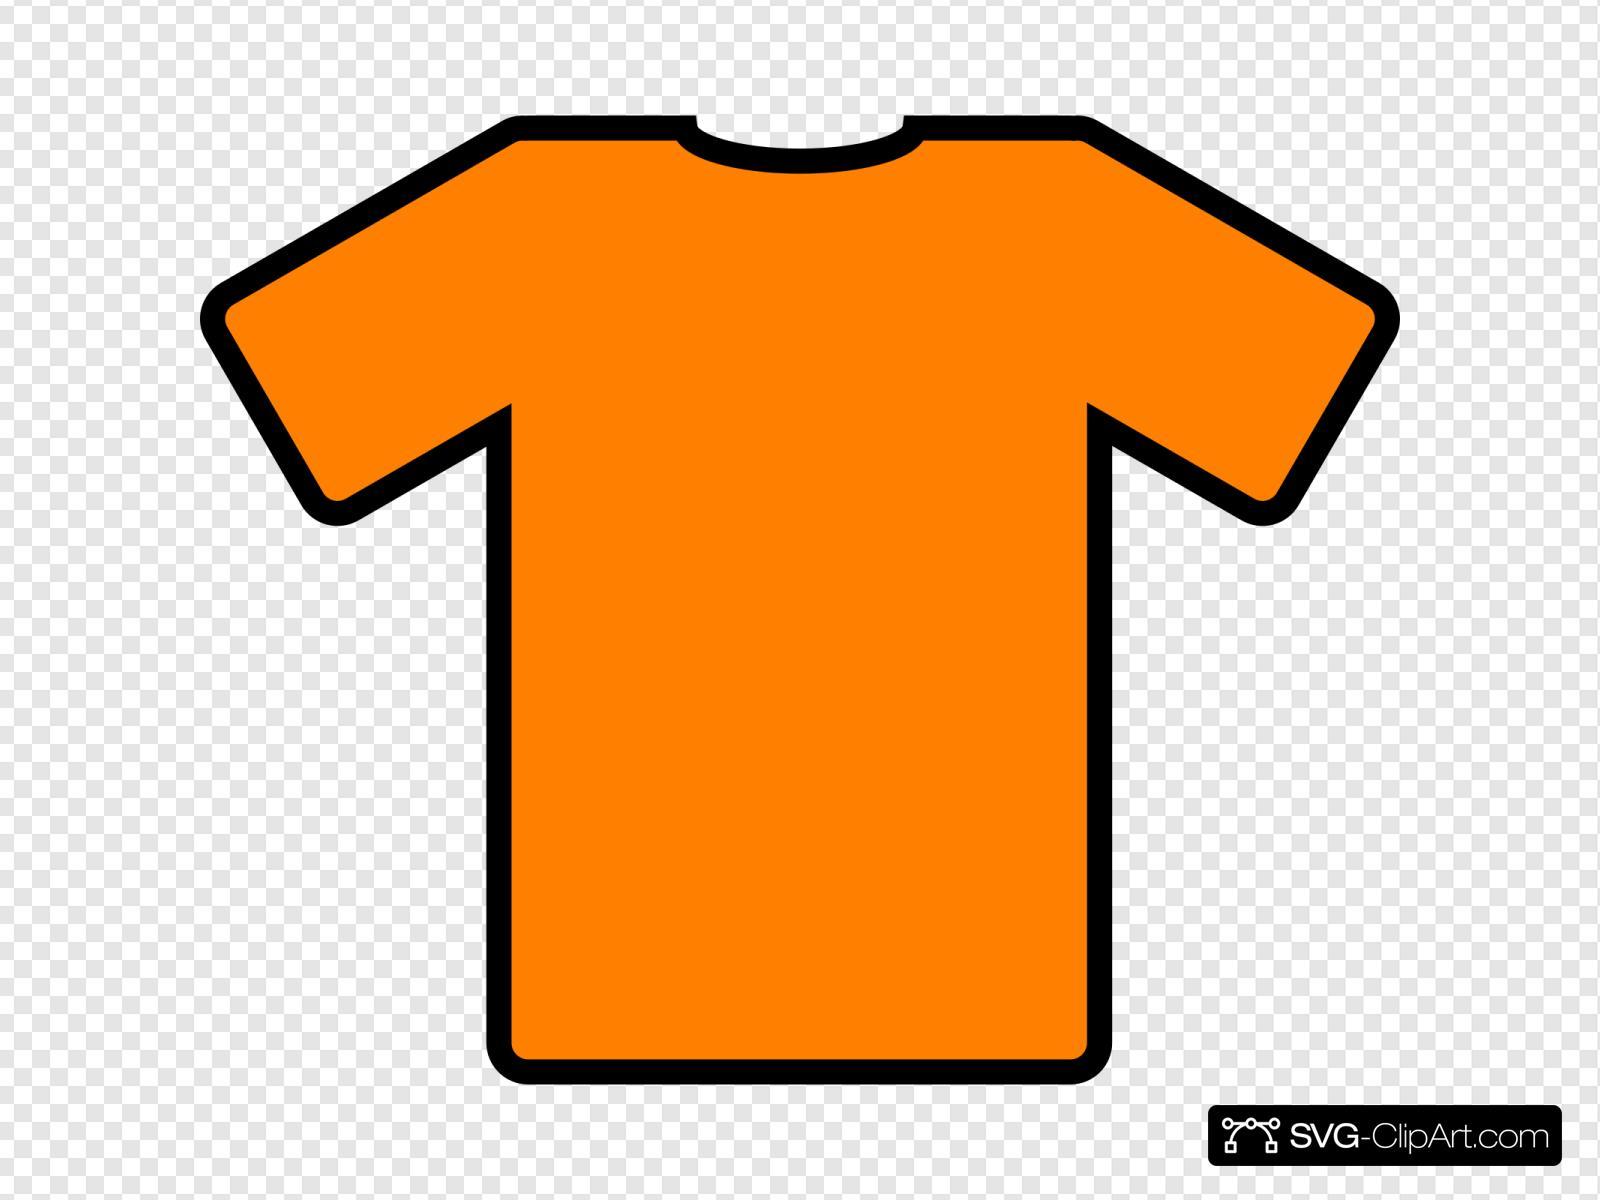 orange t shirt icon svg vector orange t shirt icon clip art svg clipart orange t shirt icon svg vector orange